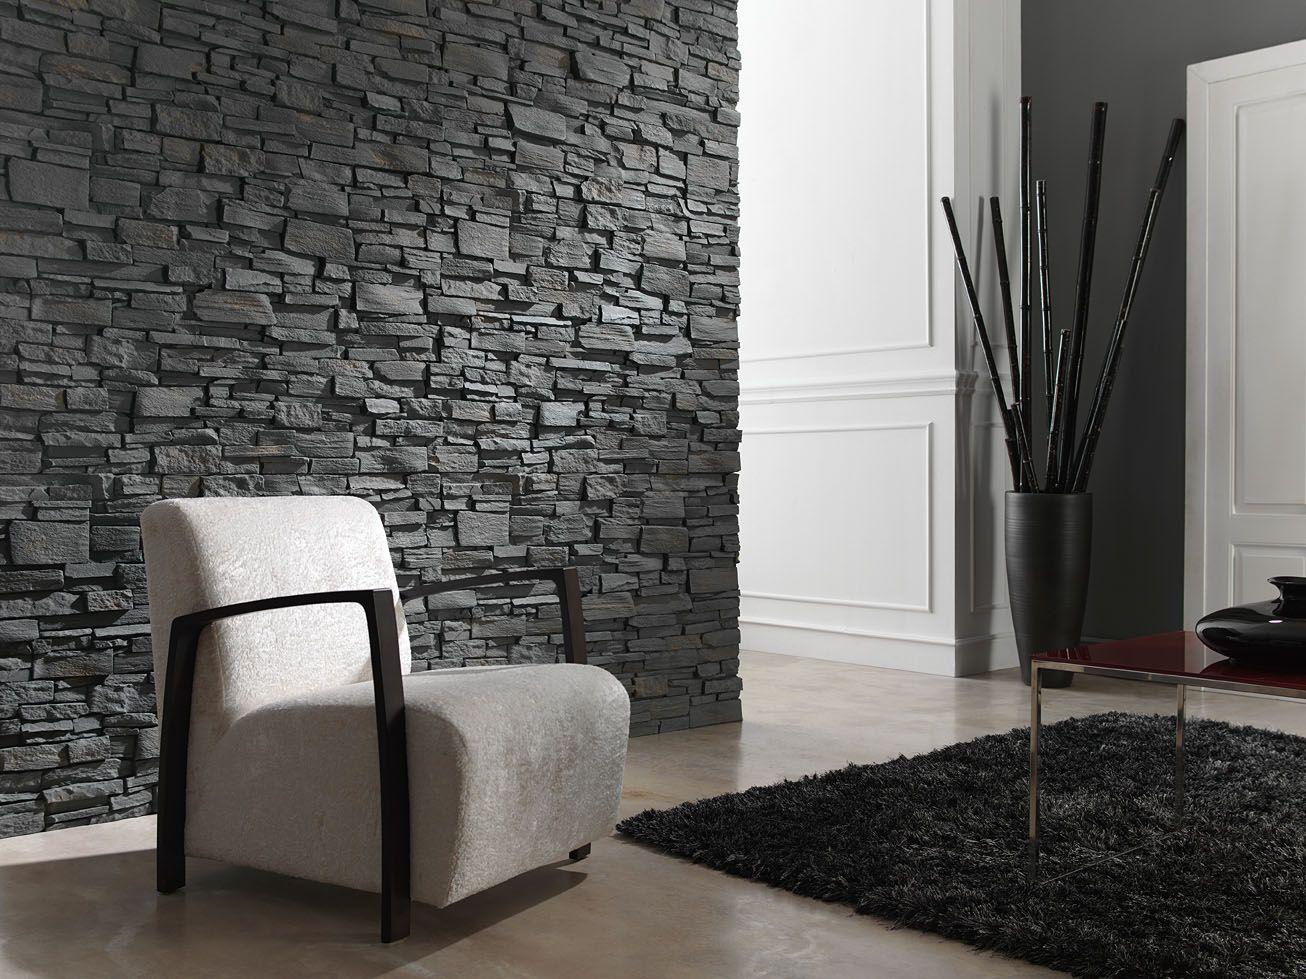 Muro piedra living deco muro piedras pinterest - Panel piedra precio ...